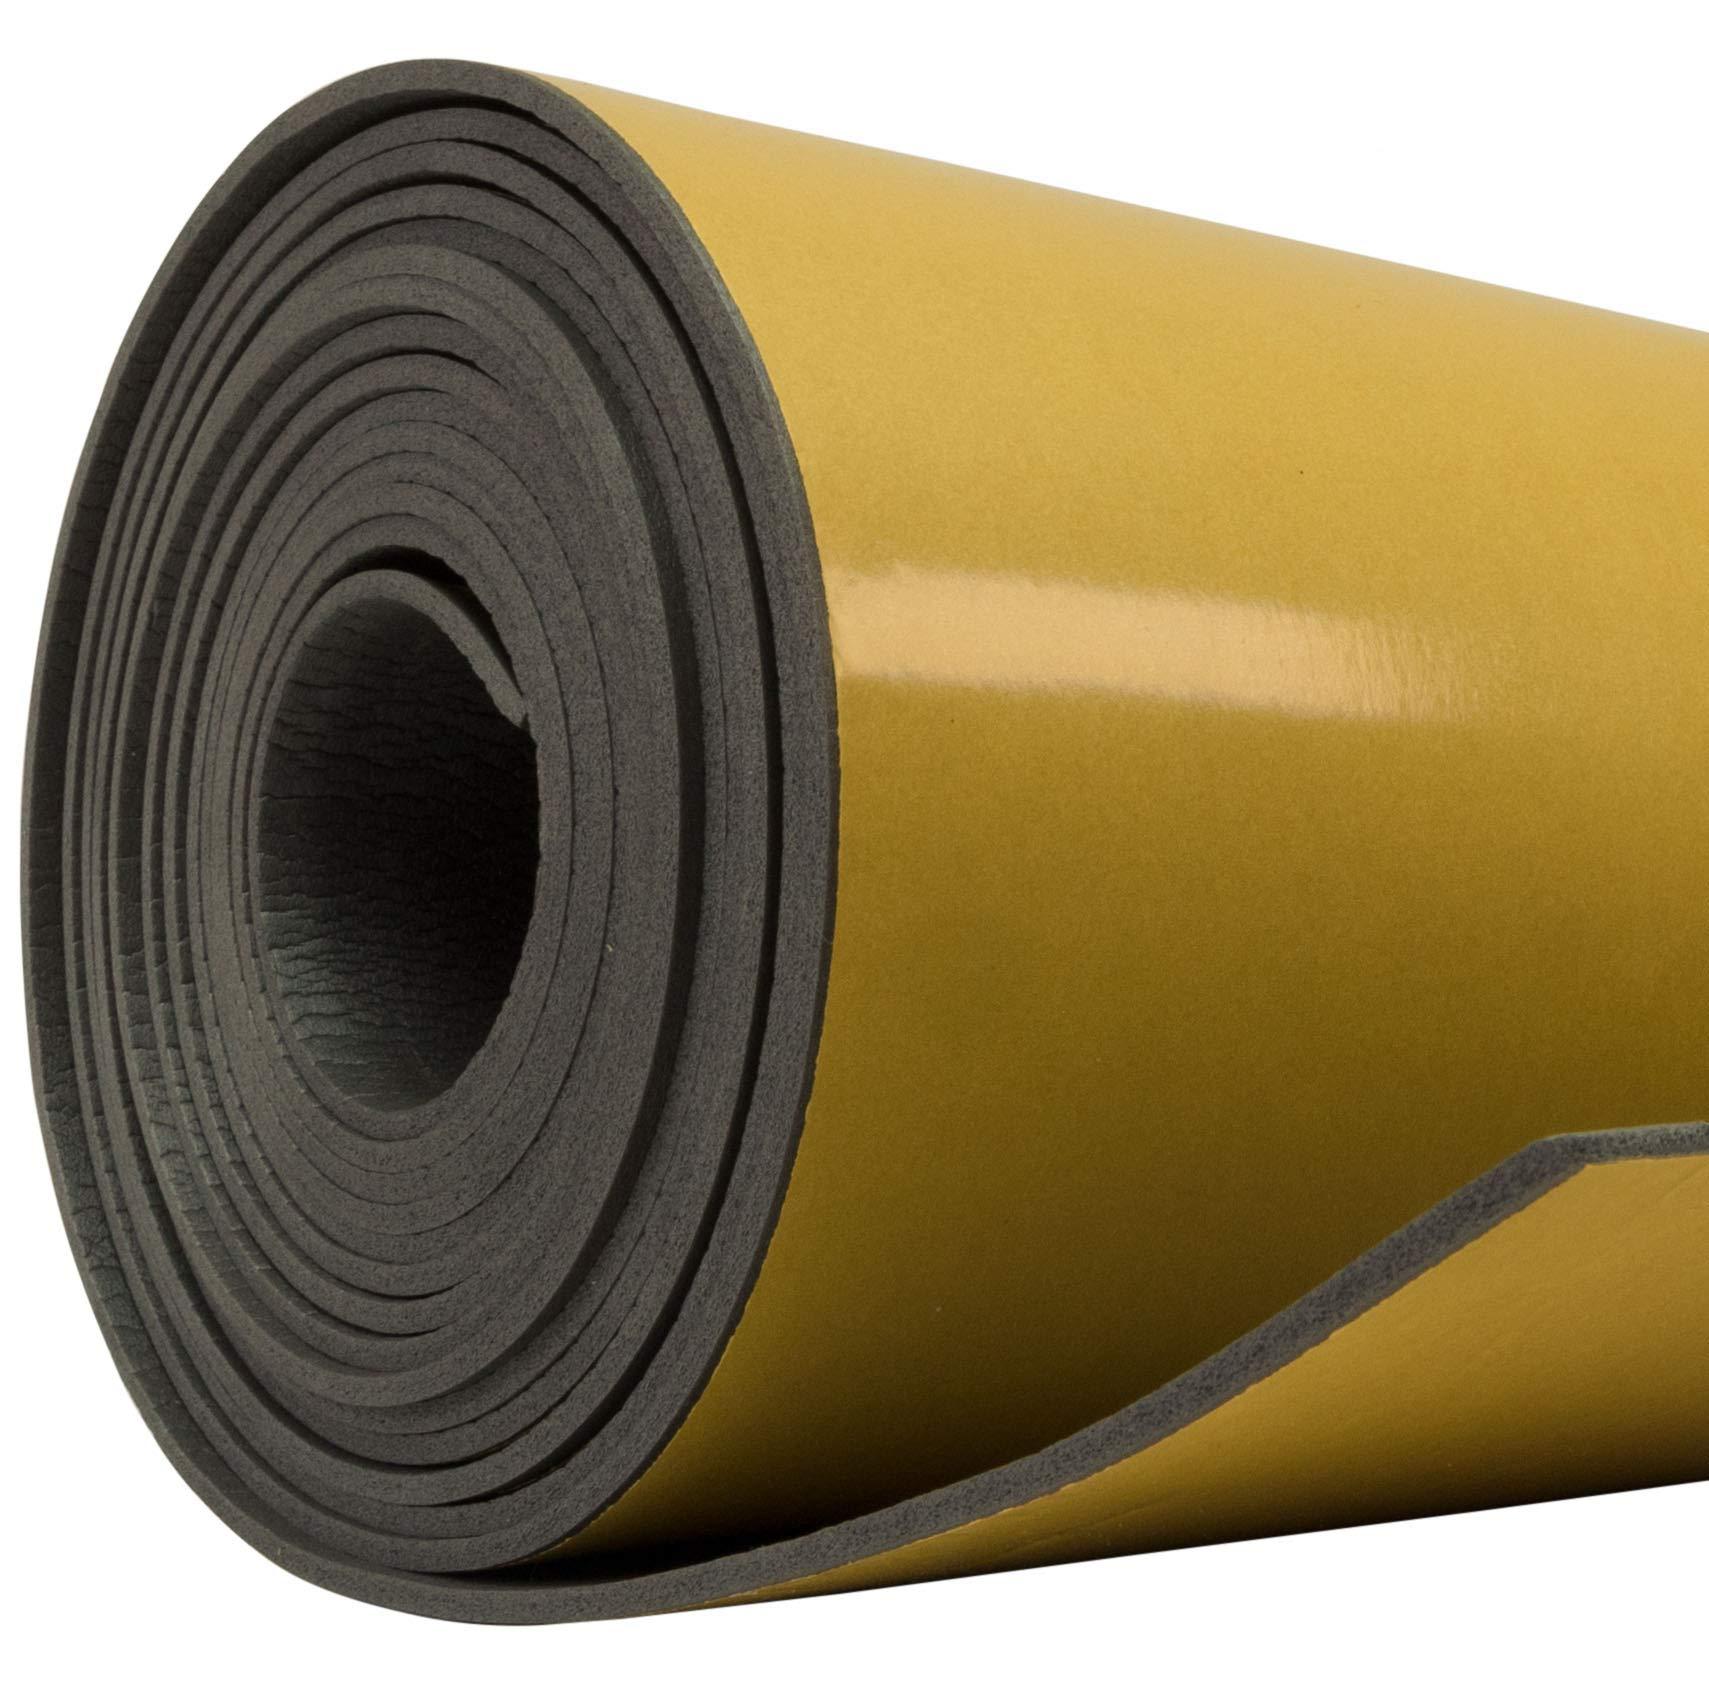 Siless Liner 157 mil 30 SqFt Sound Deadening Foam - Sound Deadener Mat - Car Sound Dampening material - Sound dampener - Sound deadening mat sound Insulation - Car Sound deadening Bulk Kit Trunk Door